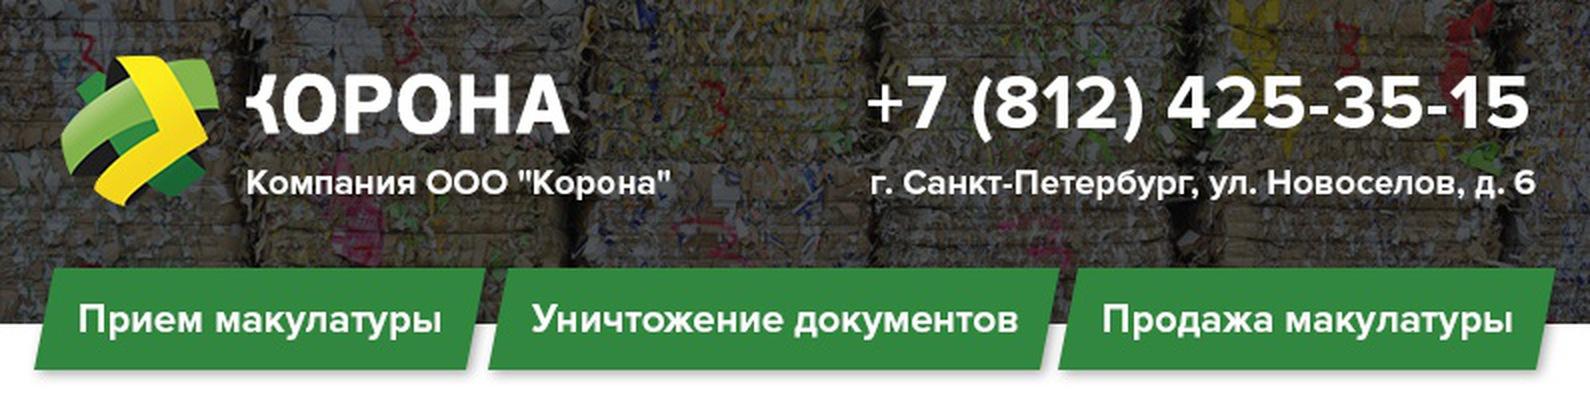 Прием макулатуры санкт петербург омск переработка макулатуры